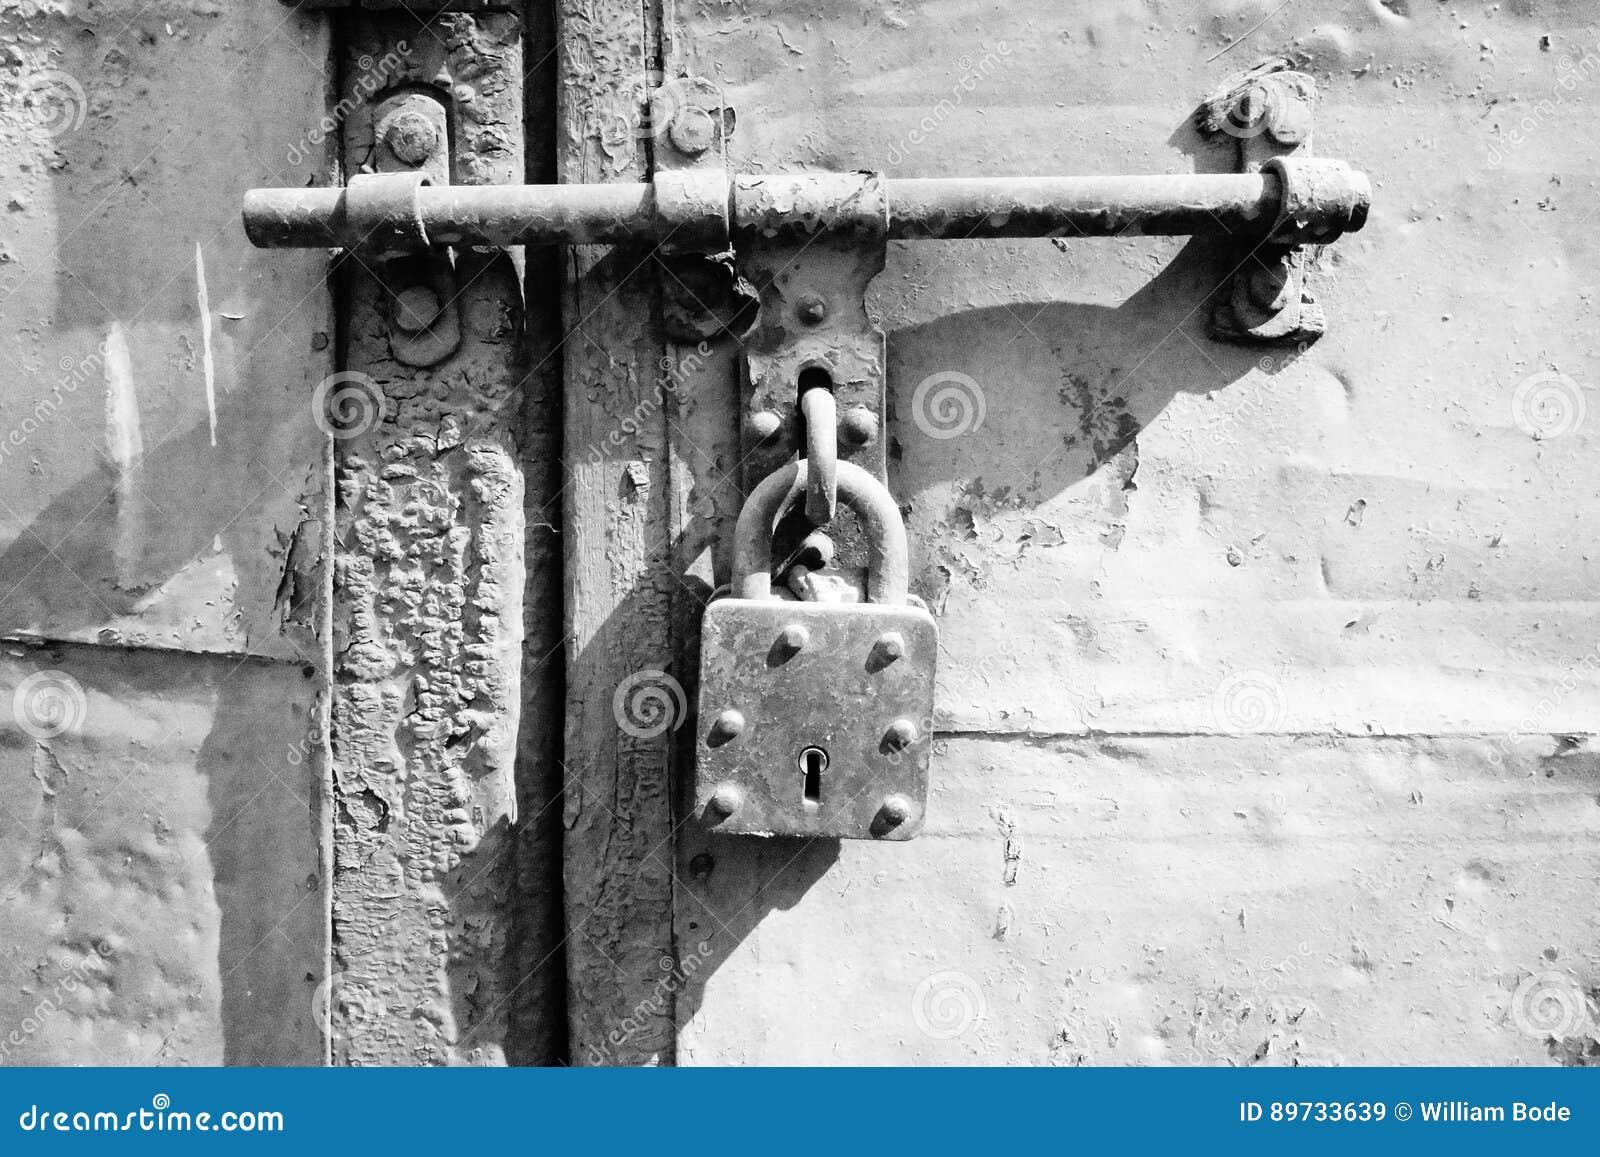 Vintage Lock On Sliding Latch Door Stock Image Image Of Coroded